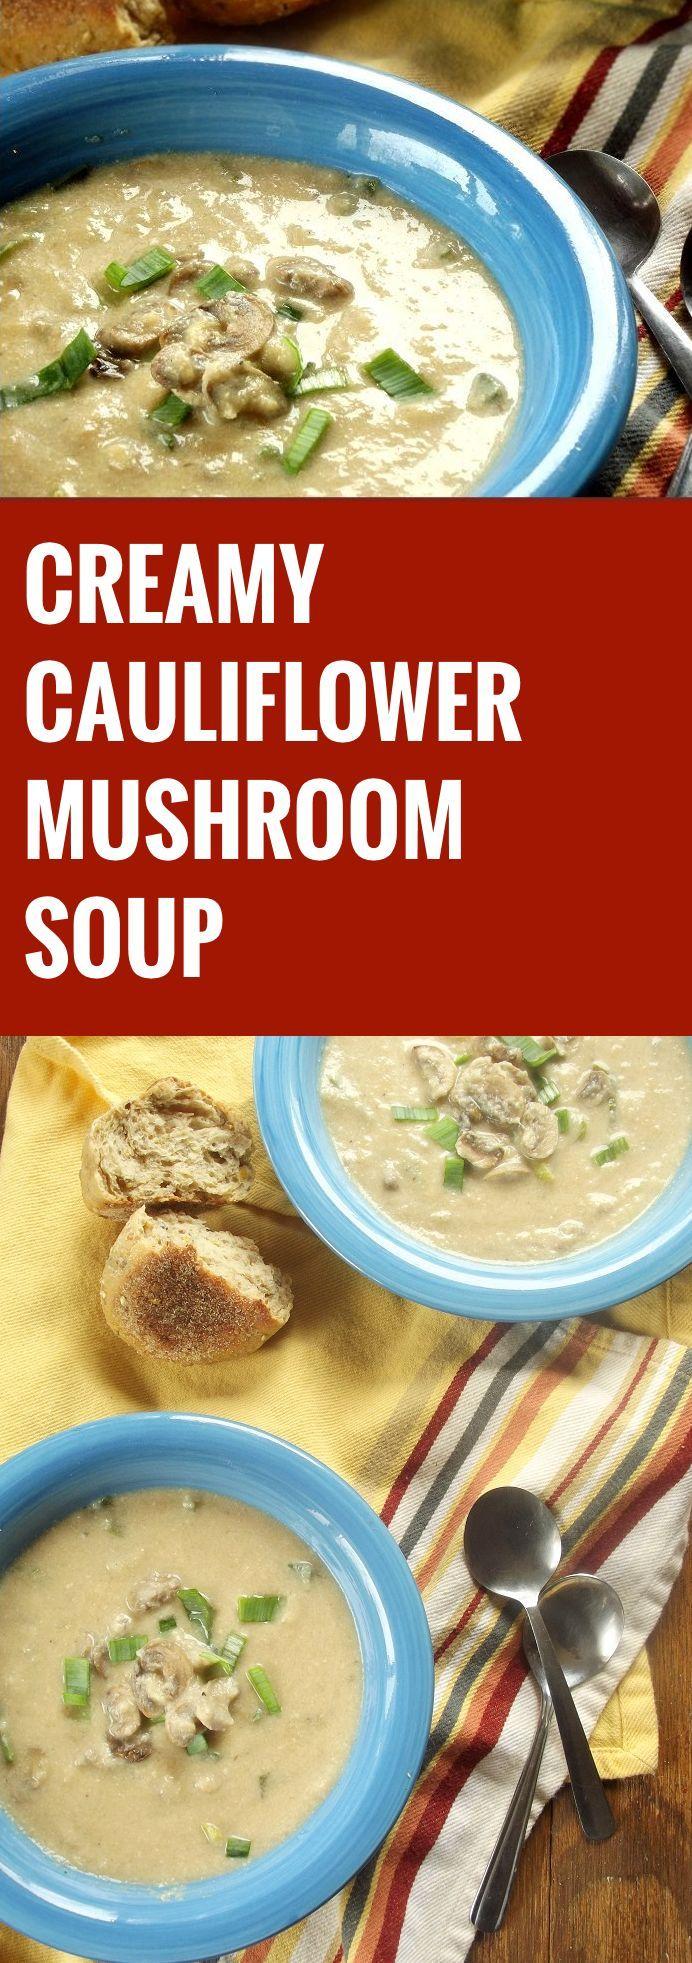 ... Soups on Pinterest | Lentil soup, French onion soups and Soup recipes